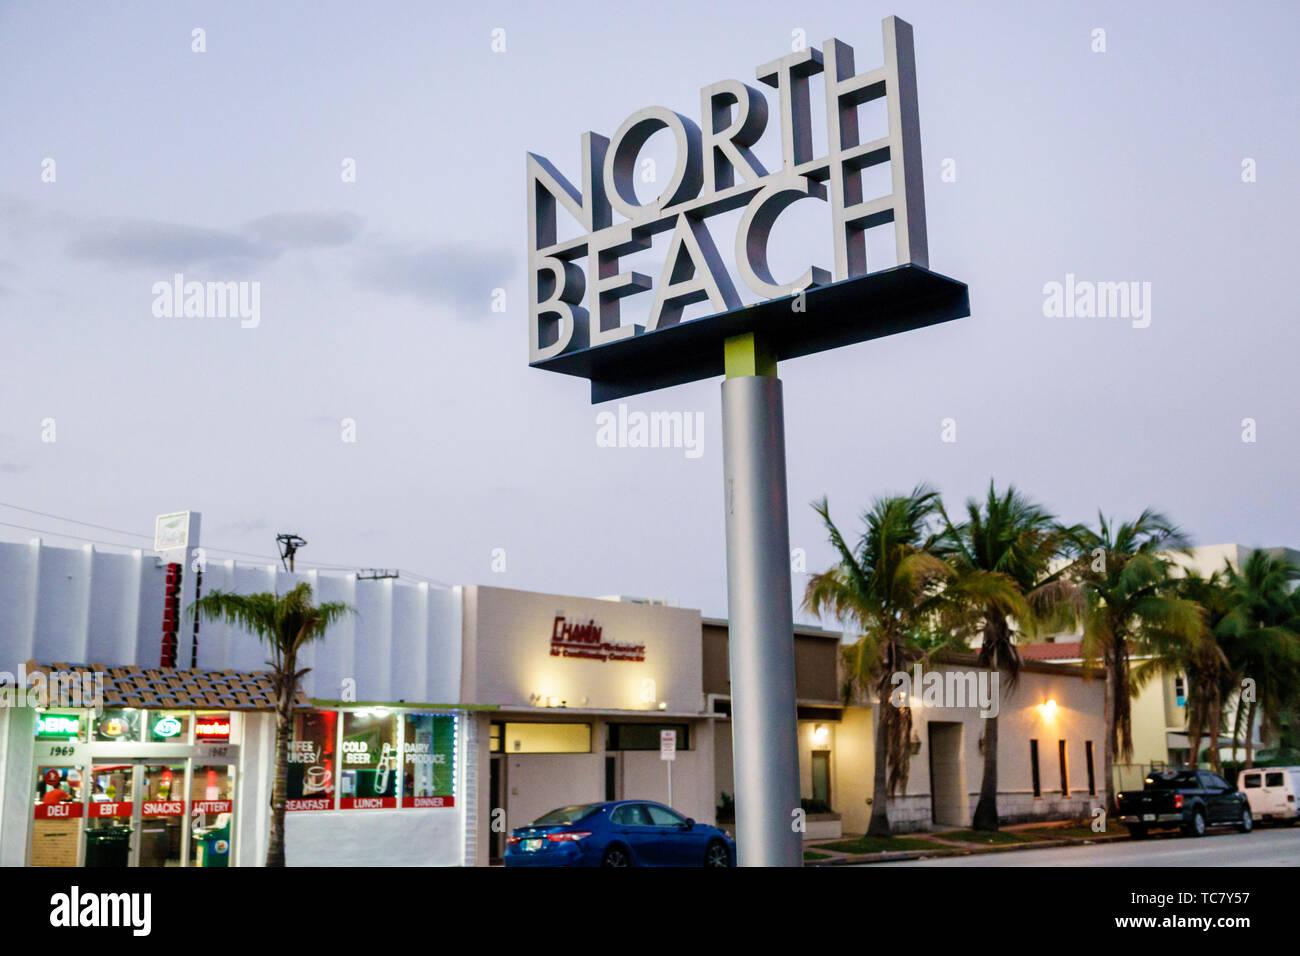 Miami Beach Florida North Beach Normandy Isle 71st Street sign - Stock Image